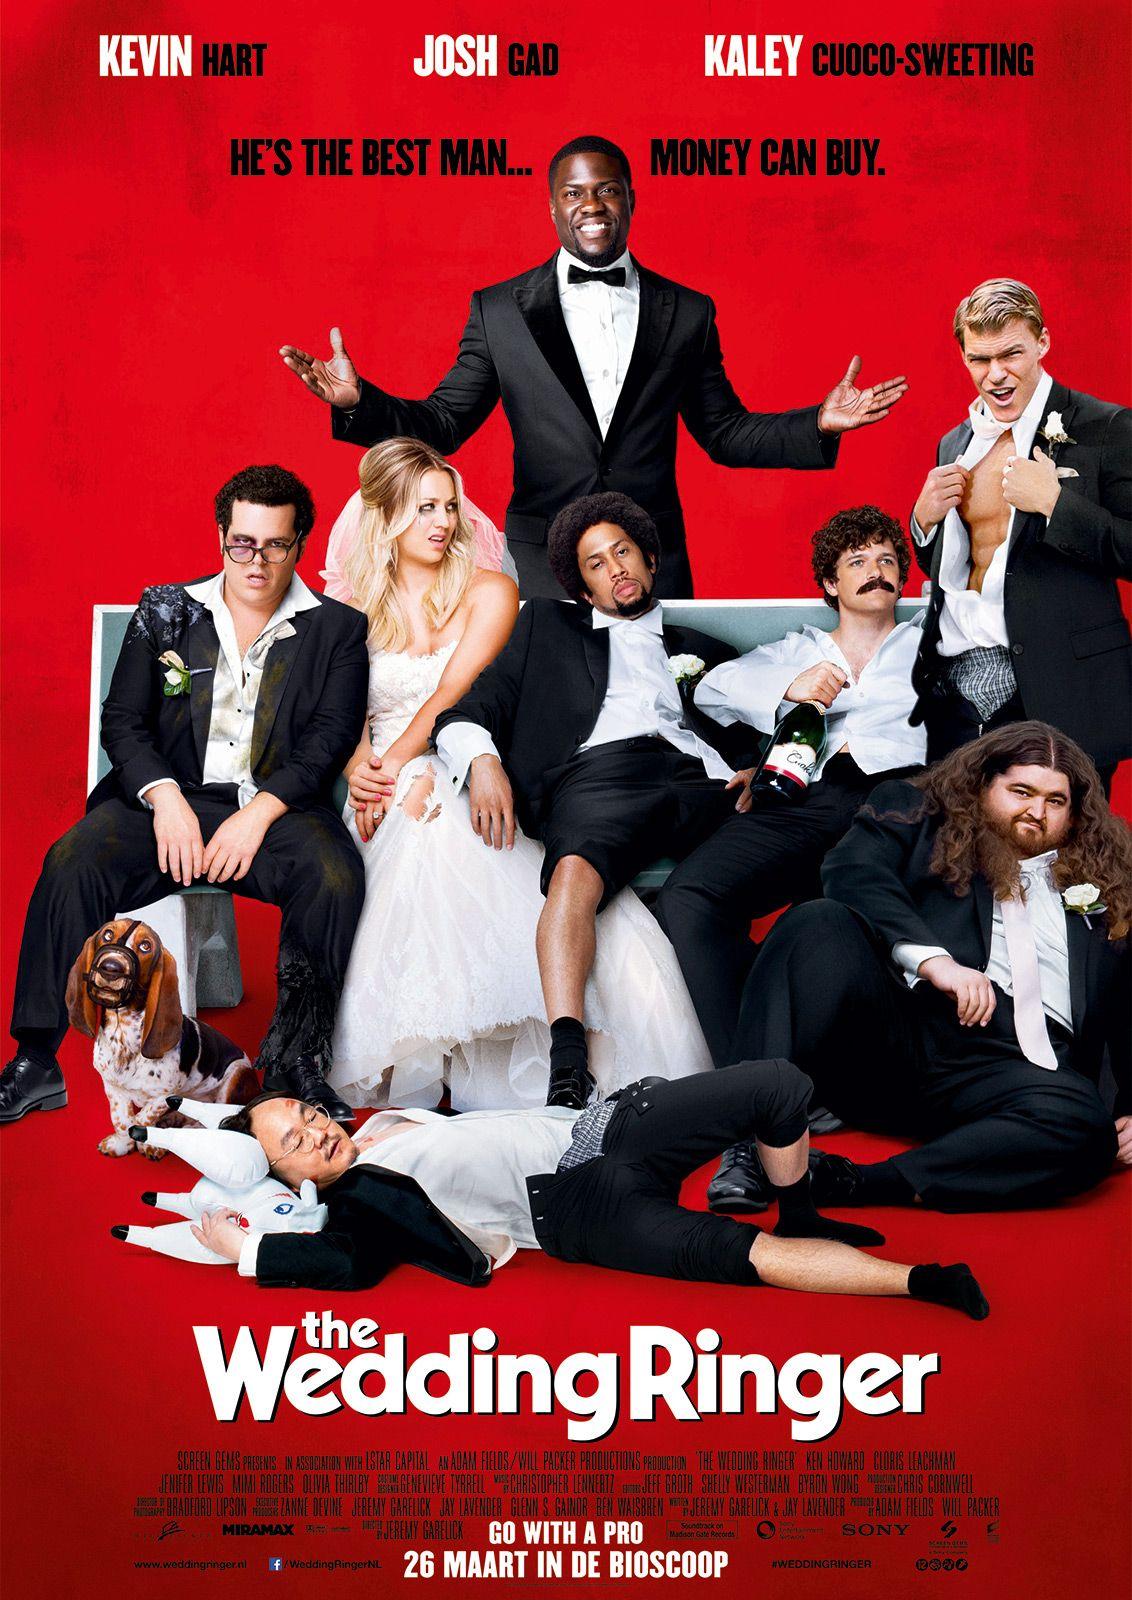 The Wedding Ringer This Movie Is Hilarious Bioscoop Komedie Kevin Hart